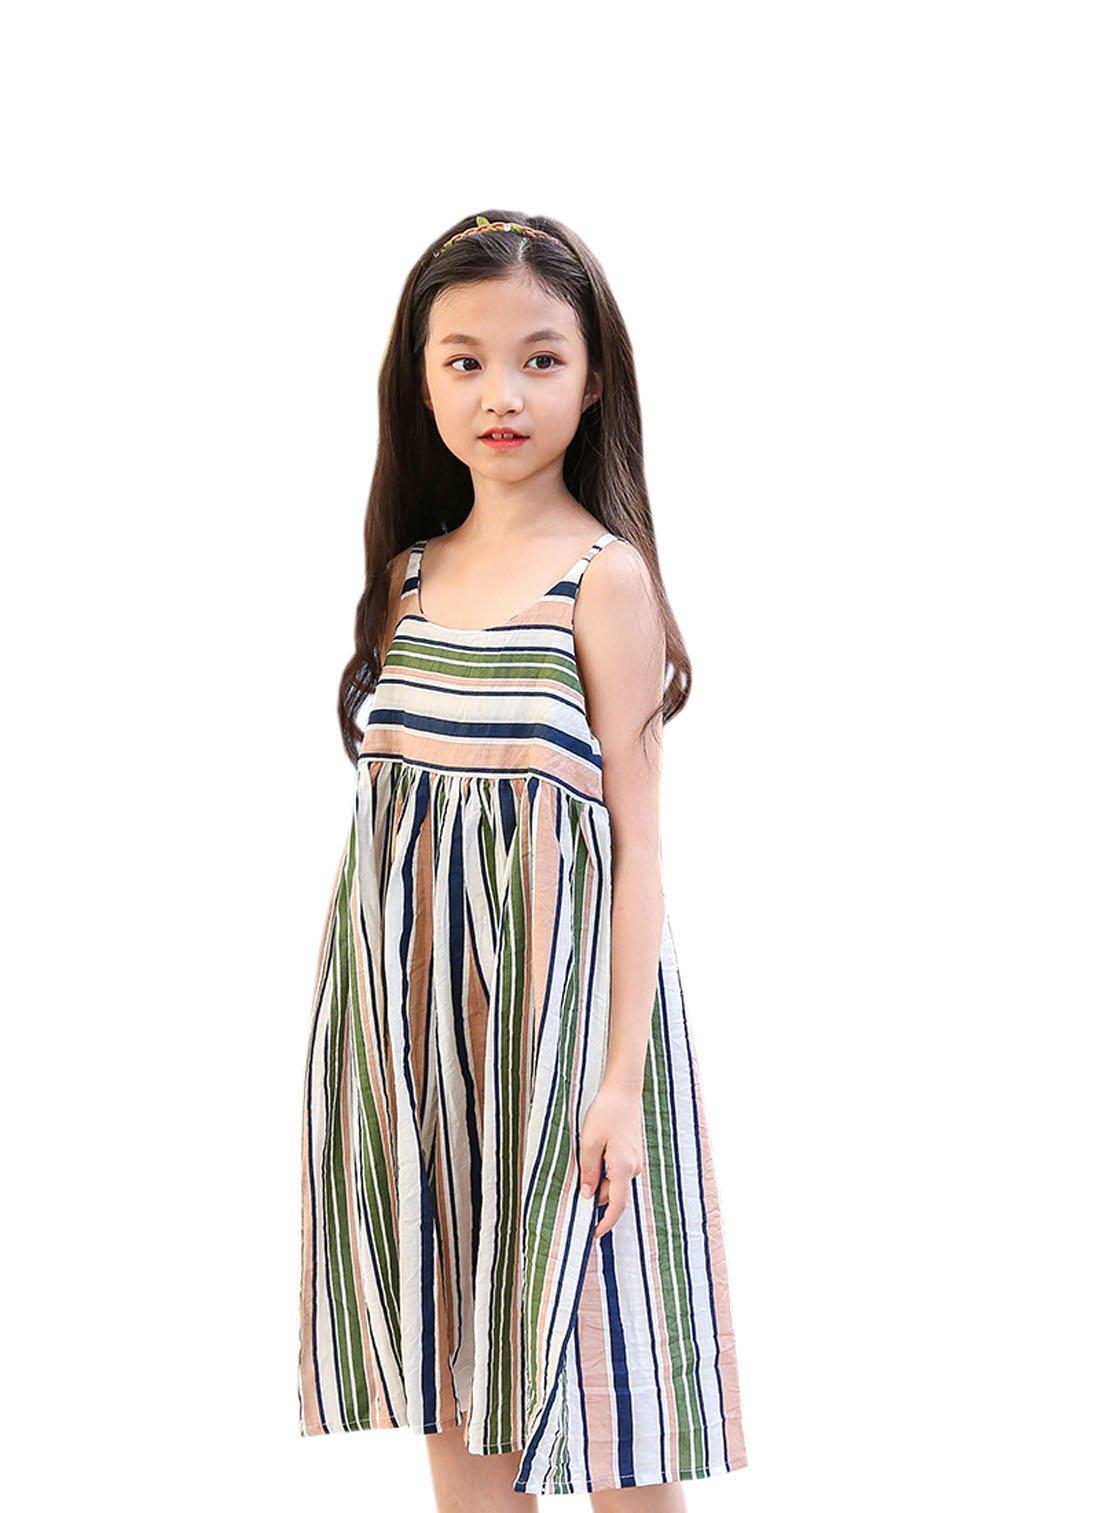 YueLian Little Girl's Short Strap Dress Sleeveless Stripes Summer Travel Outfits (8-9 Years)